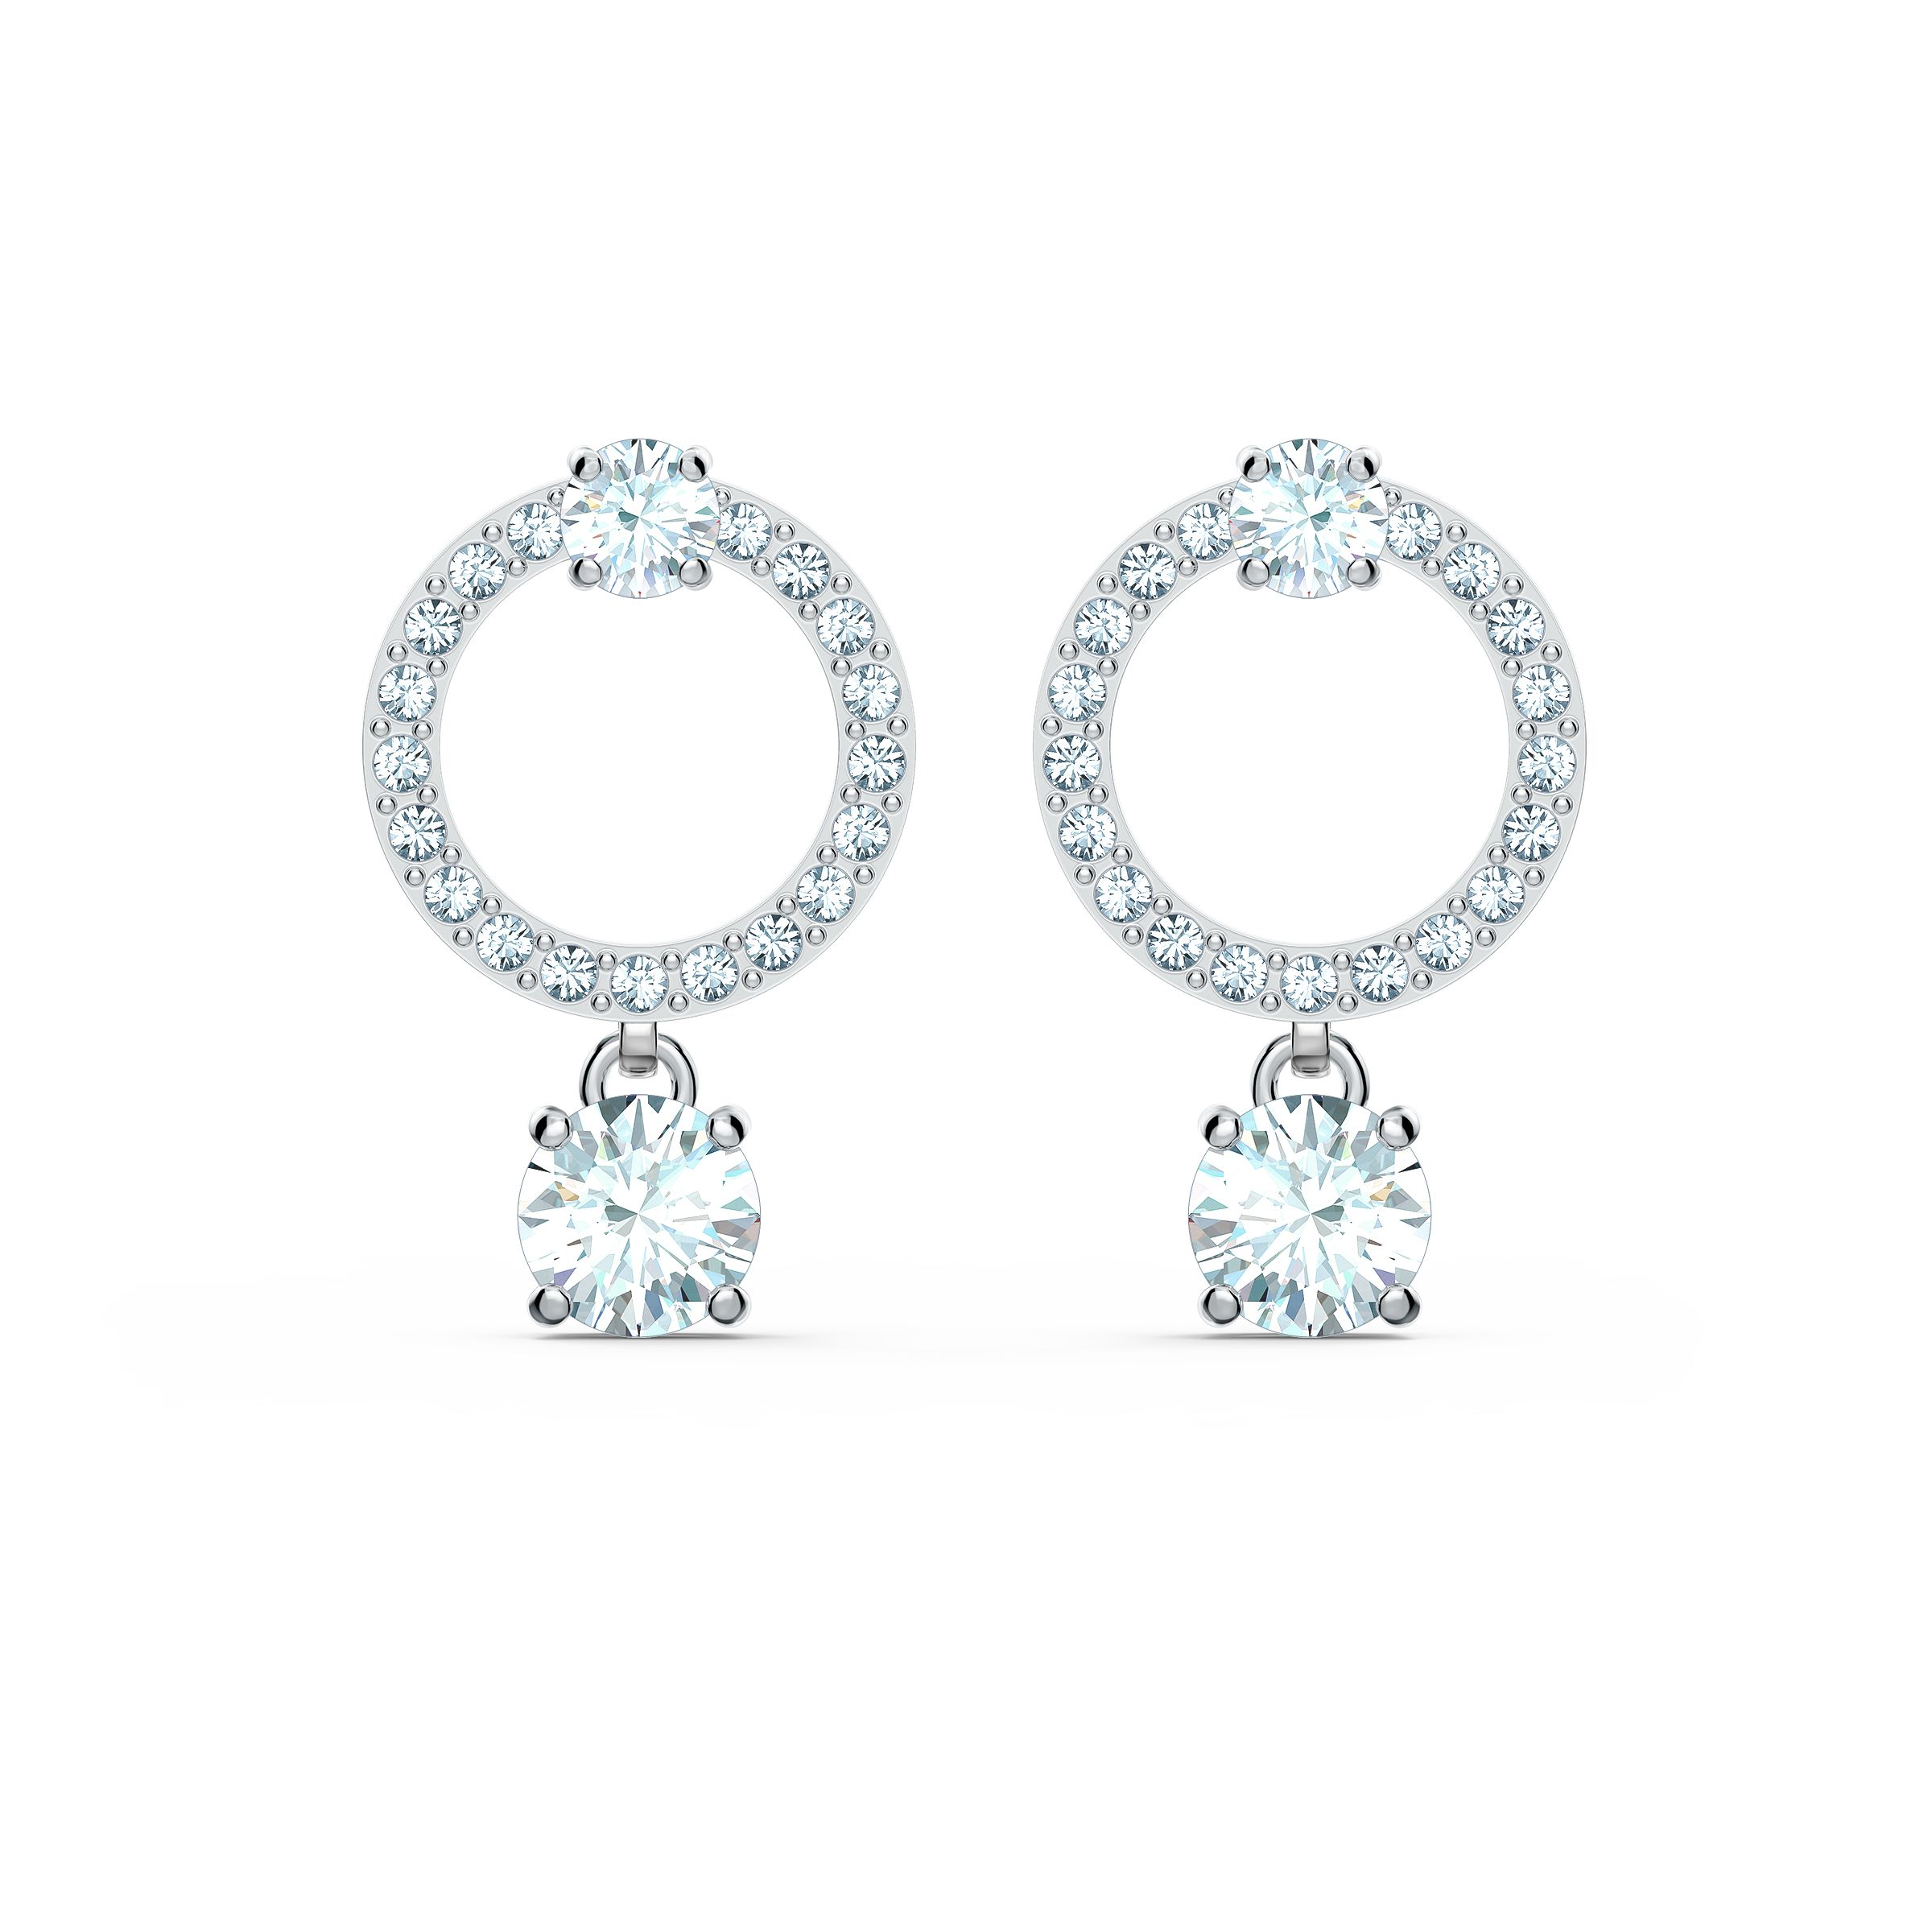 Boucles d'oreilles Attract Circle, blanc, métal rhodié, Swarovski